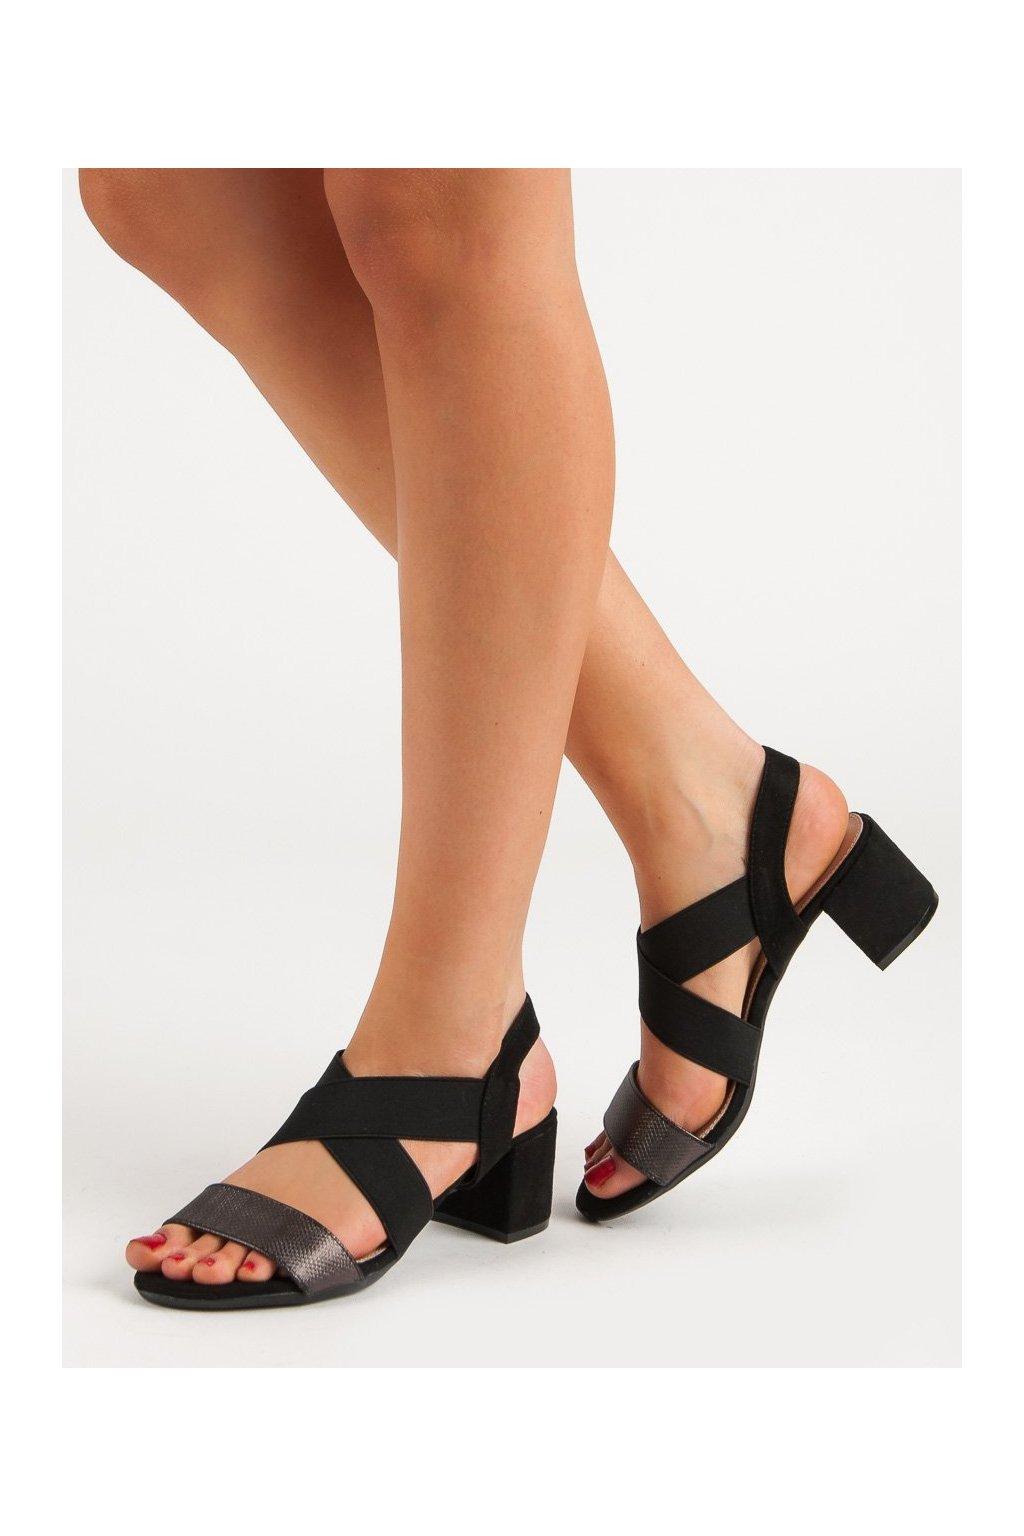 Čierne sandále Filippo kod DS789/19B